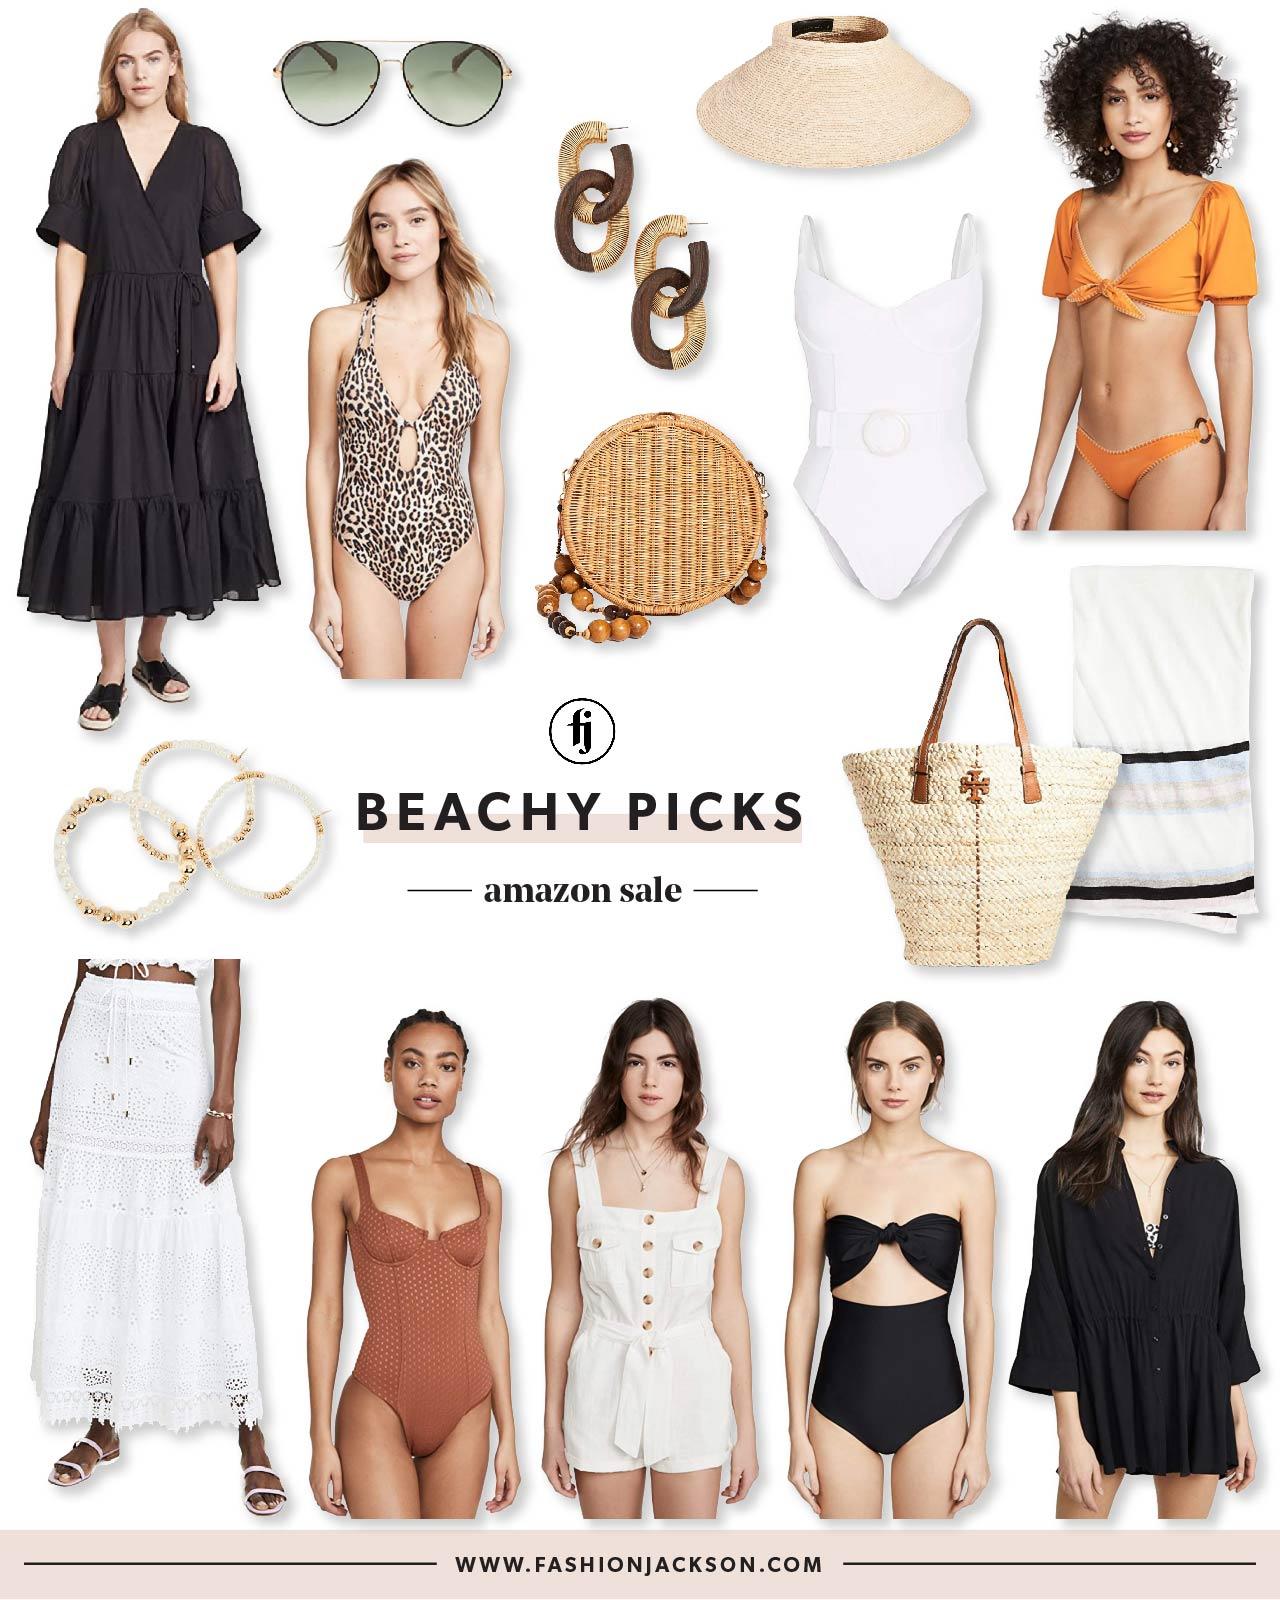 fashion jackson amazon big style sale